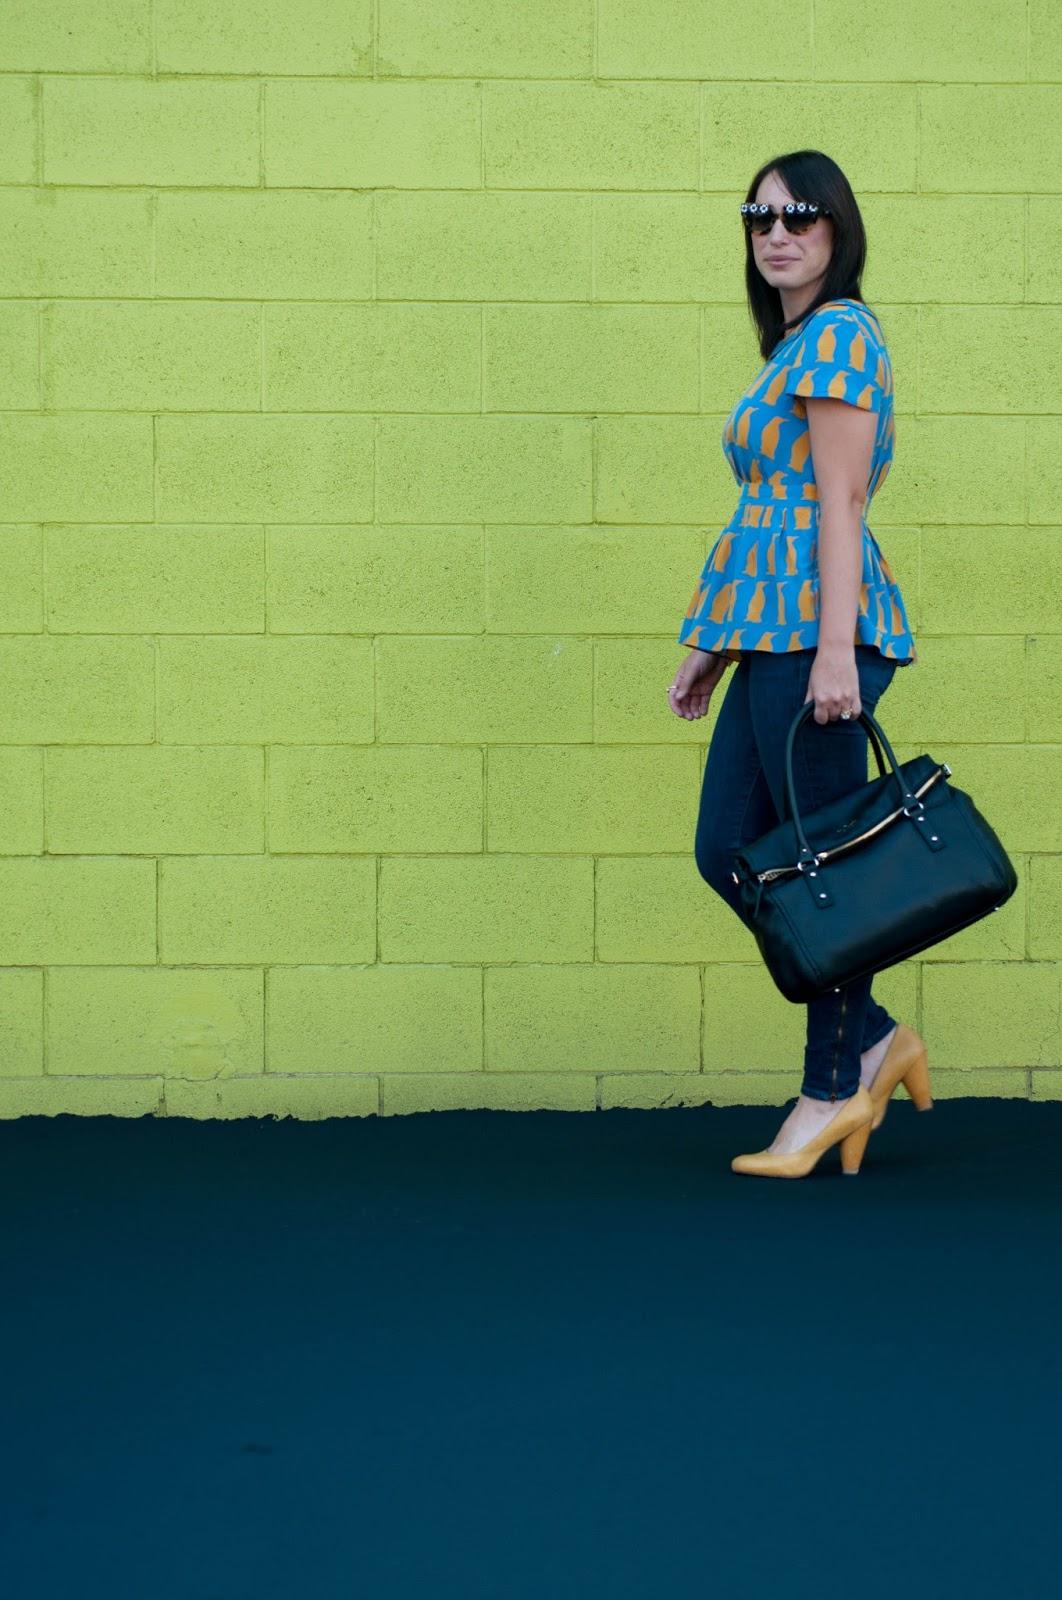 ootd, style blog, fashion blog, anthropologie ootd, kate spade cobble hill satchel, prada flower sunglasses